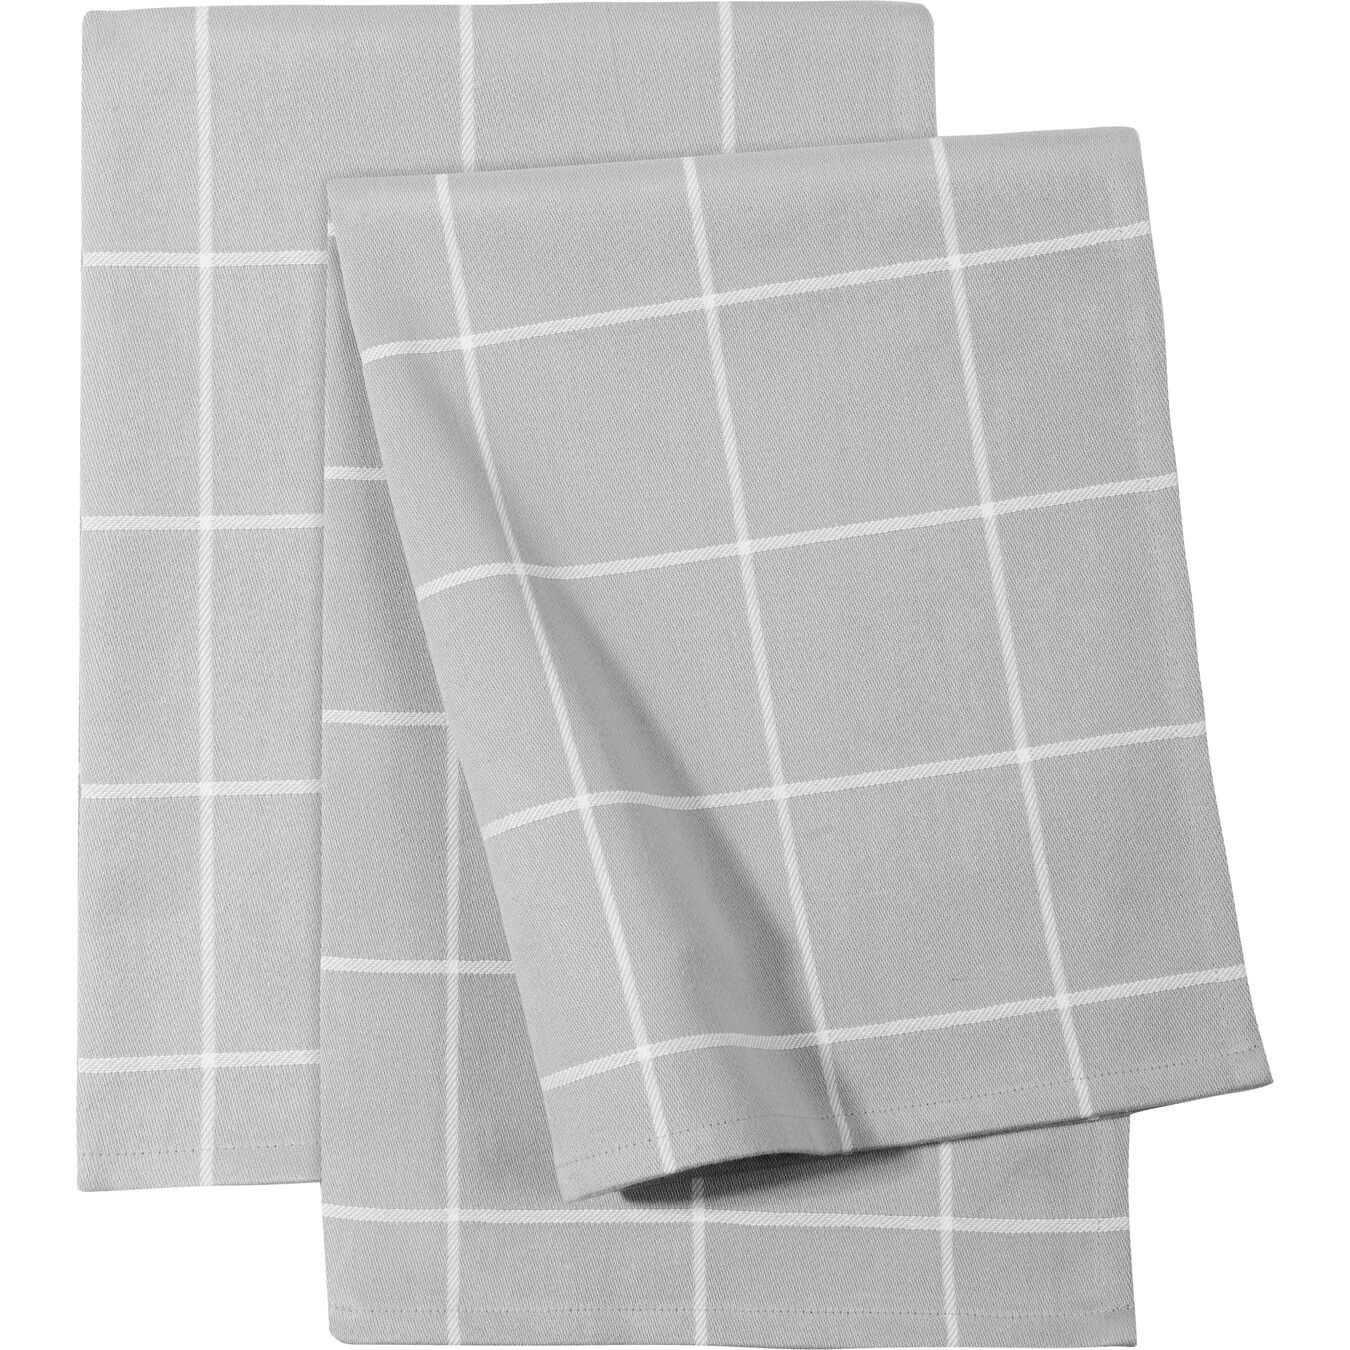 Set strofinacci a scacchi - 2-pz., grigio,,large 1